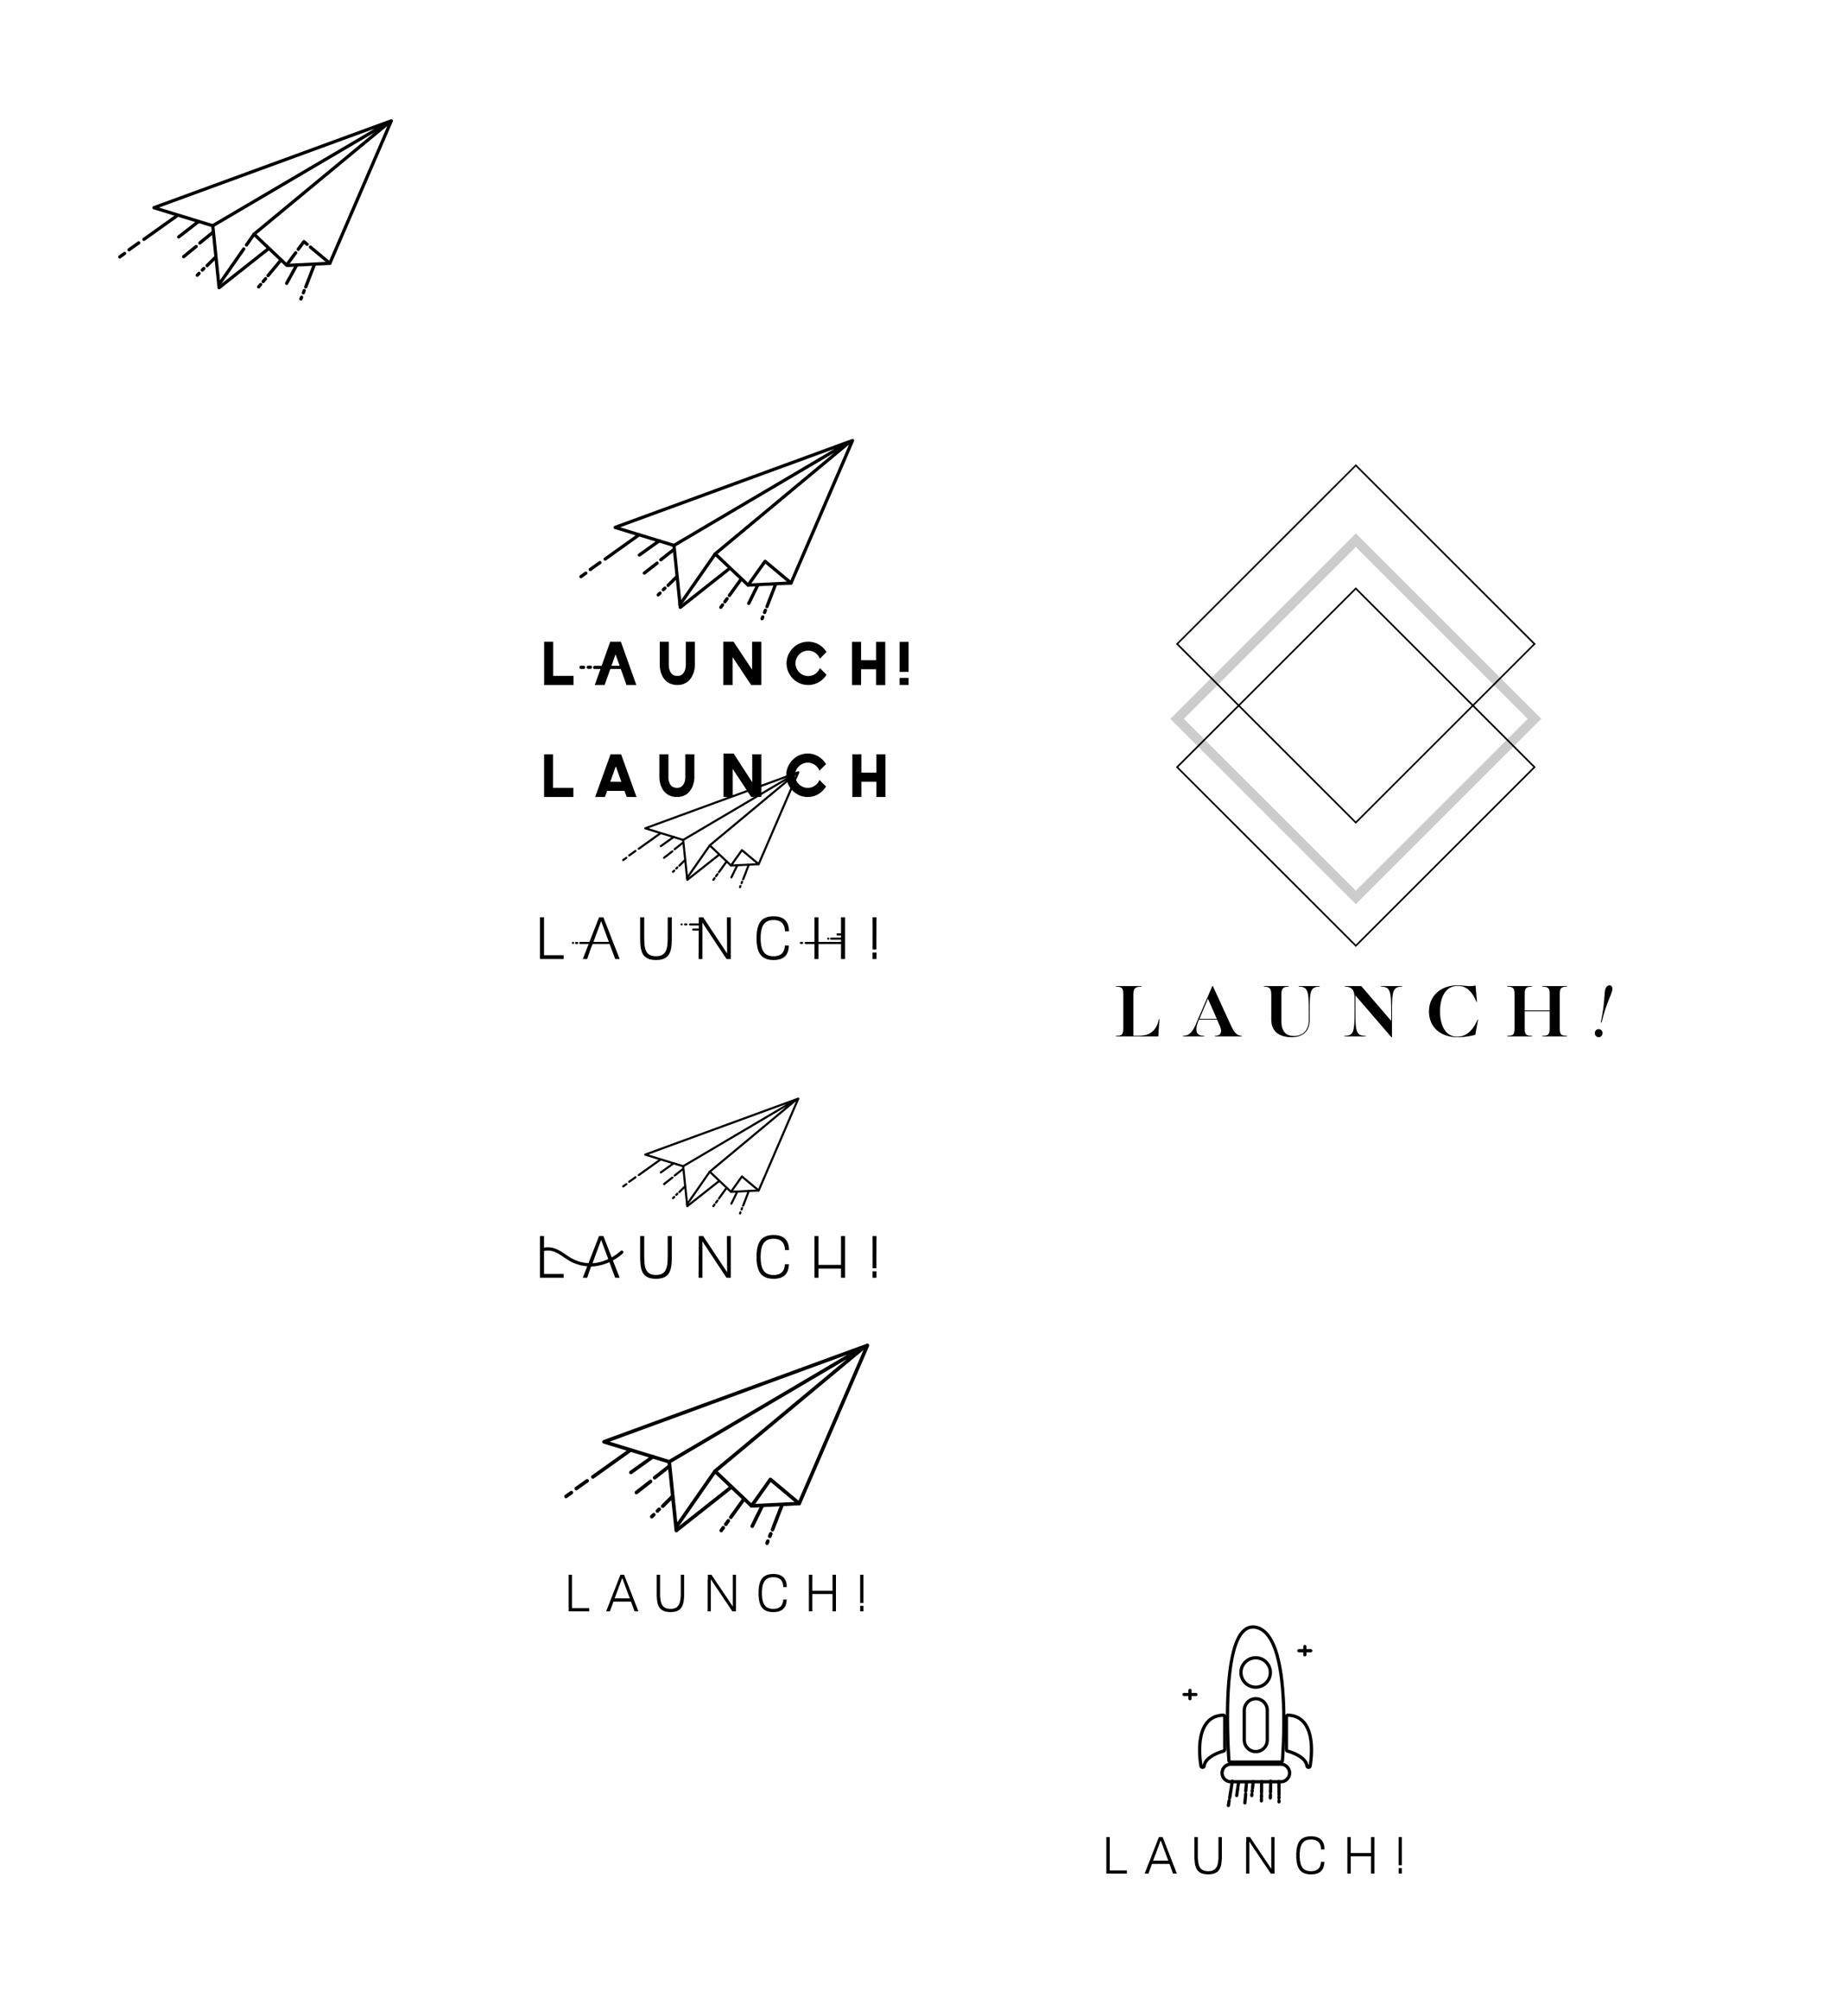 Original concept sketches